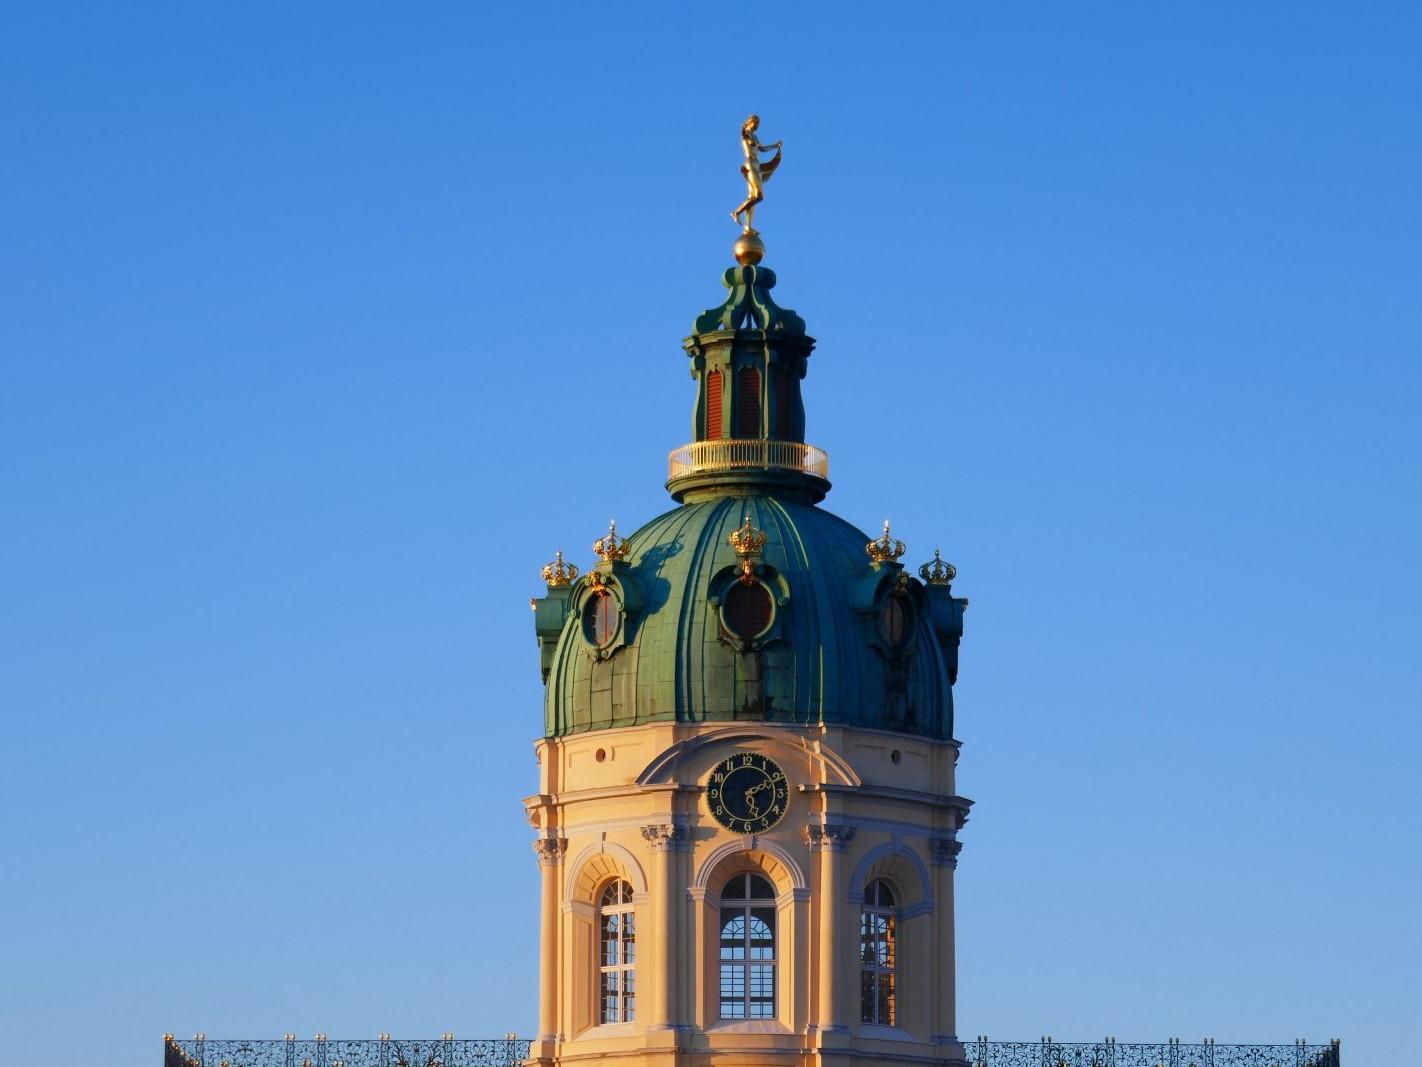 Schloss Charlottenburg Berlin - Foto: Stefan Rethfeld